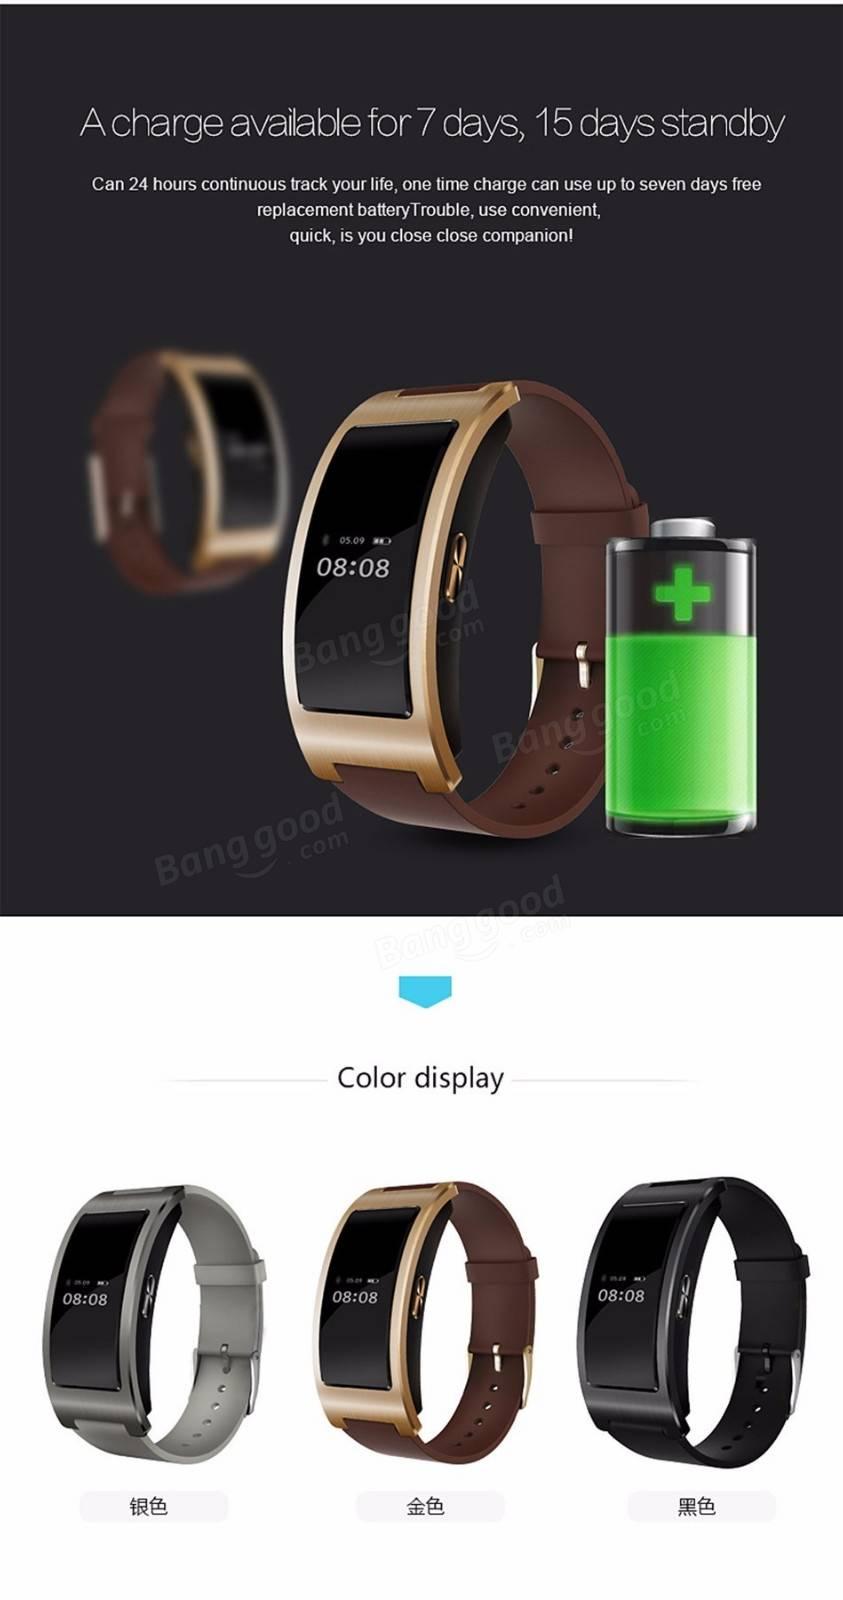 CK11 Bluetooth 4.0 Display Blood Pressure Heart Rate Monitor Smart Wristband Bracelet